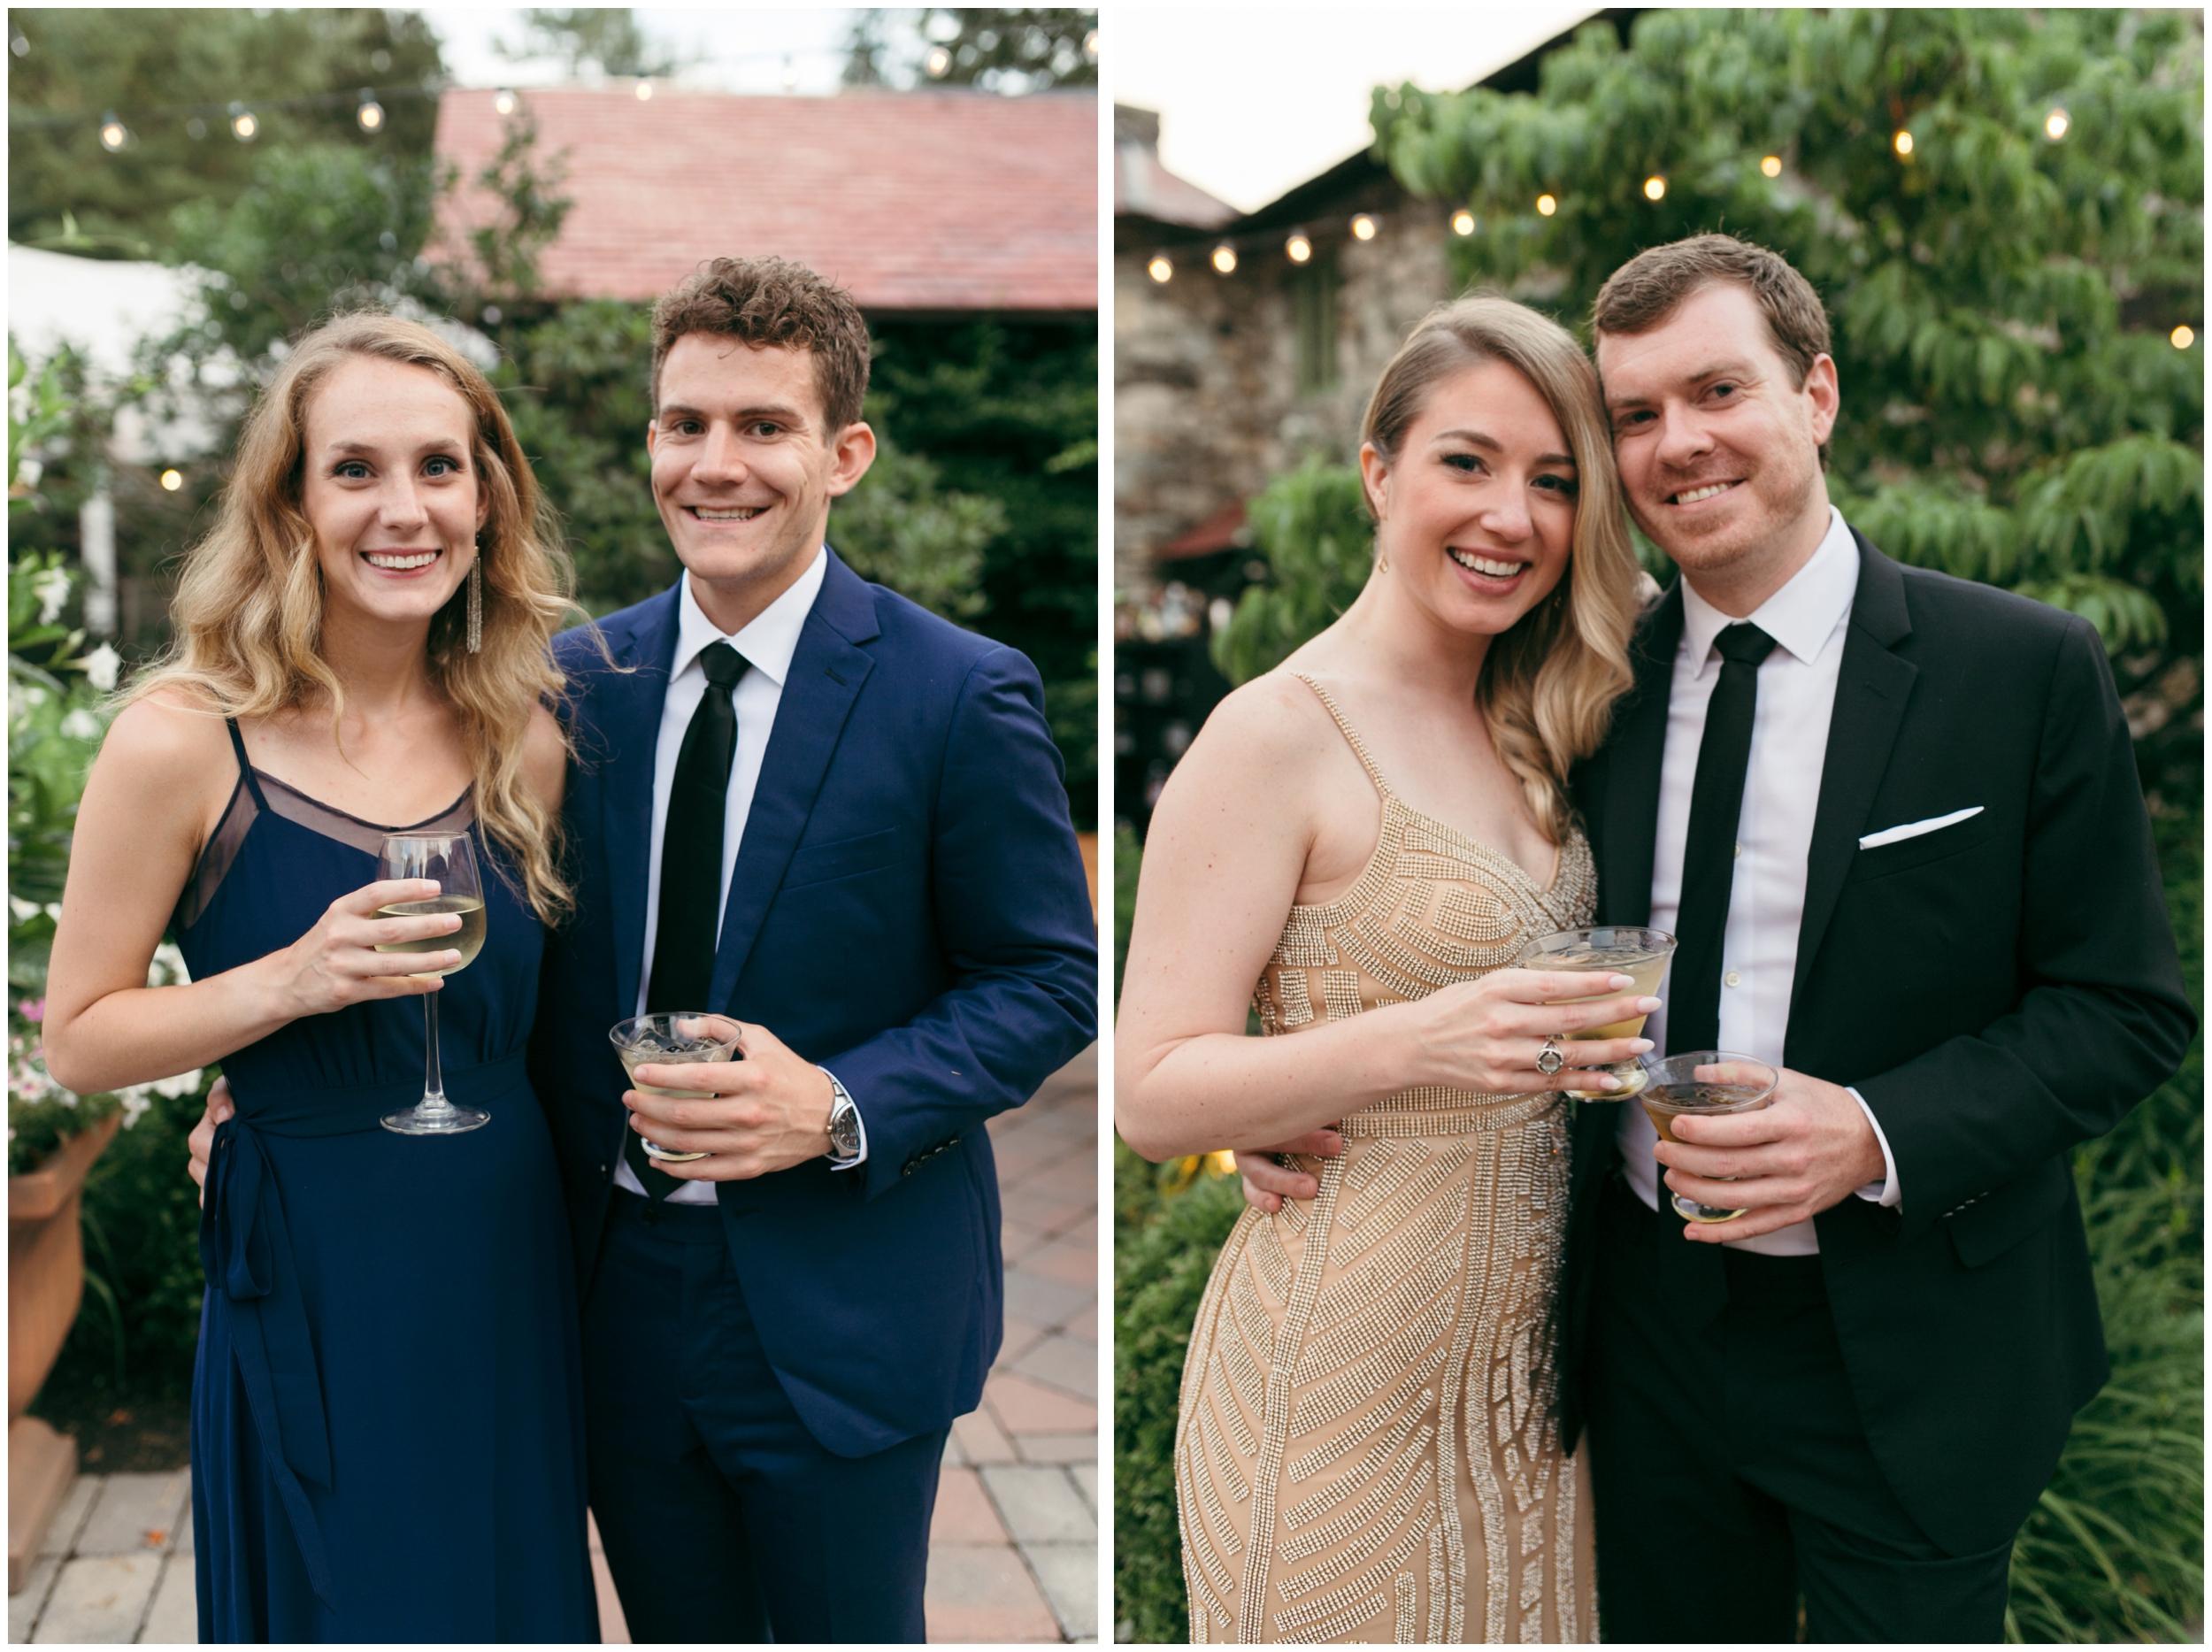 Willowdale-Estate-Wedding-Bailey-Q-Photo-Boston-Wedding-Photographer-093.JPG